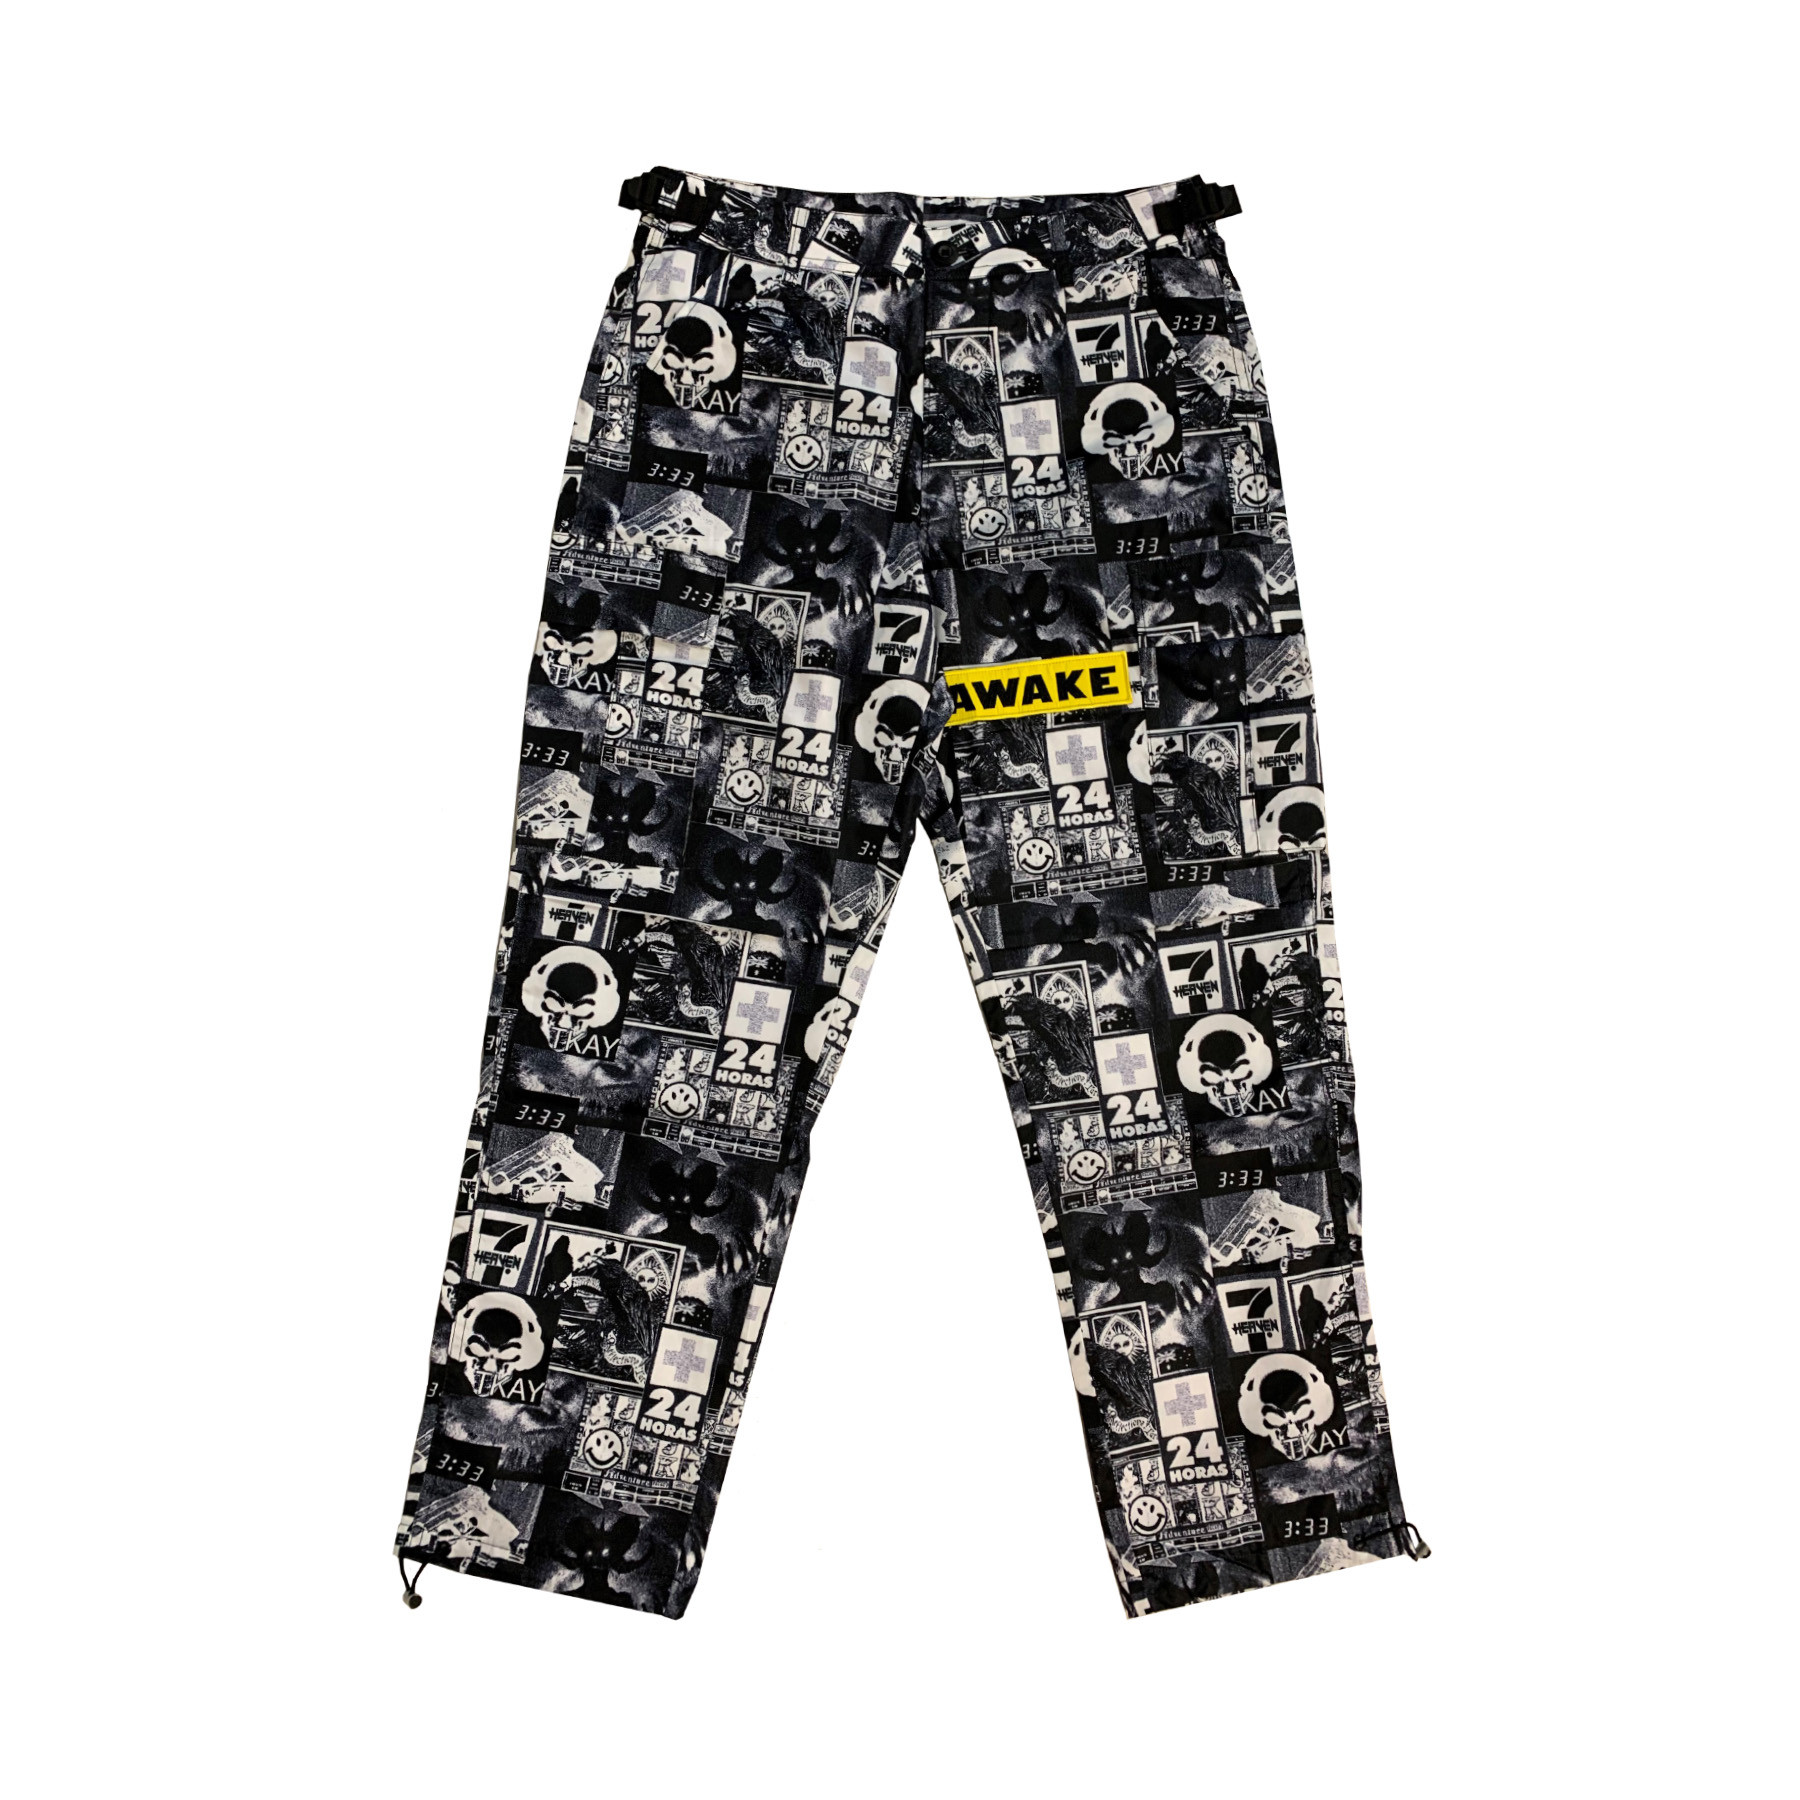 Awake Unisex Cargo Pants